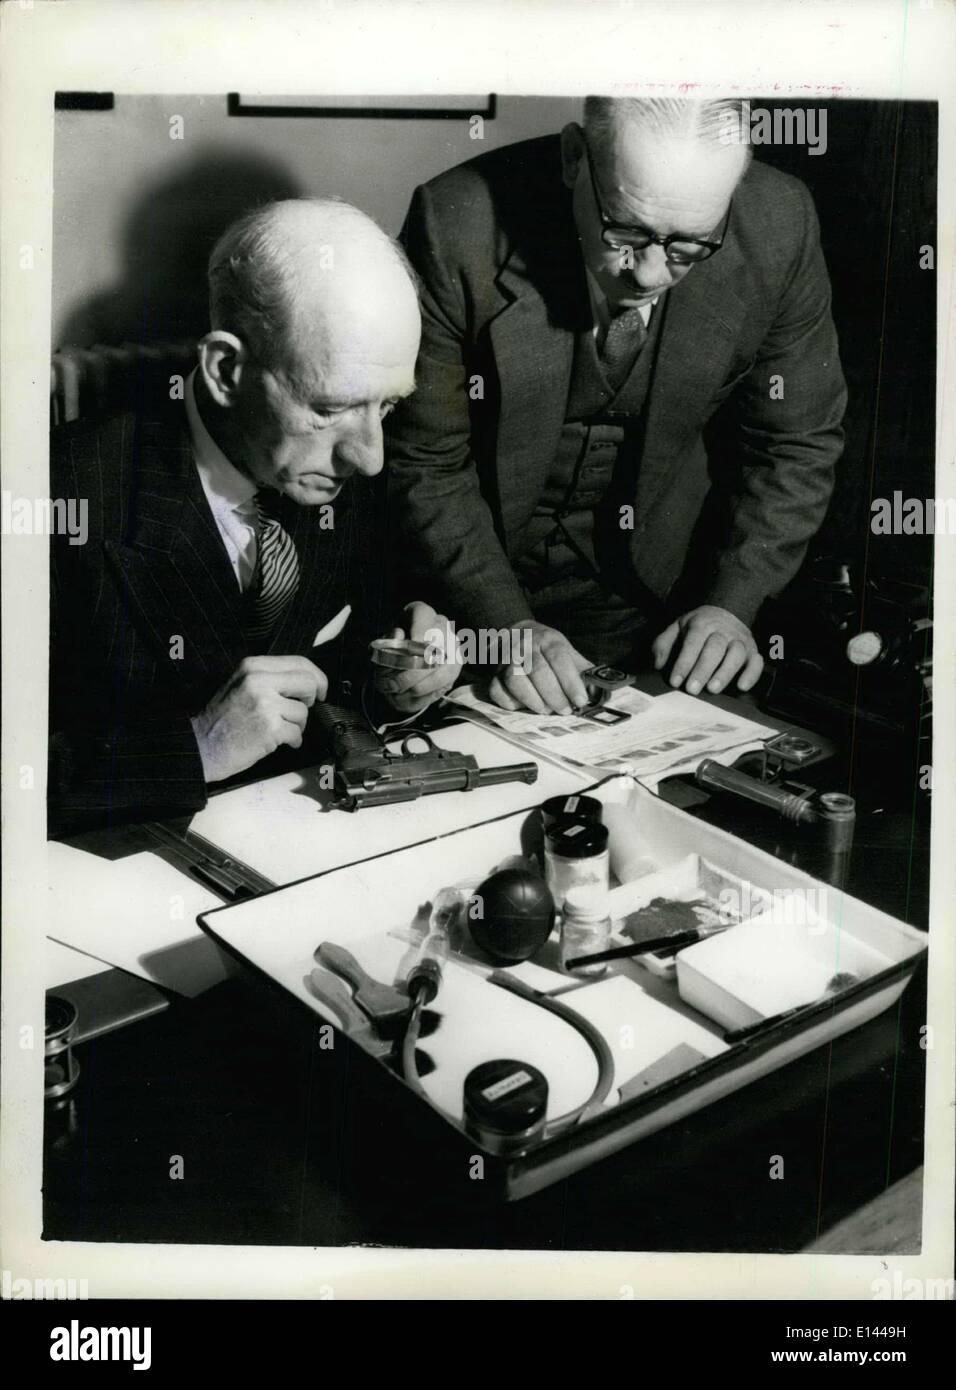 Apr. 04, 2012 - Head of Fingerprint & Photographic Department:Chief Superintendent J.Livangs, M.B.E, confers with a senior staff member (standing) - Stock Image